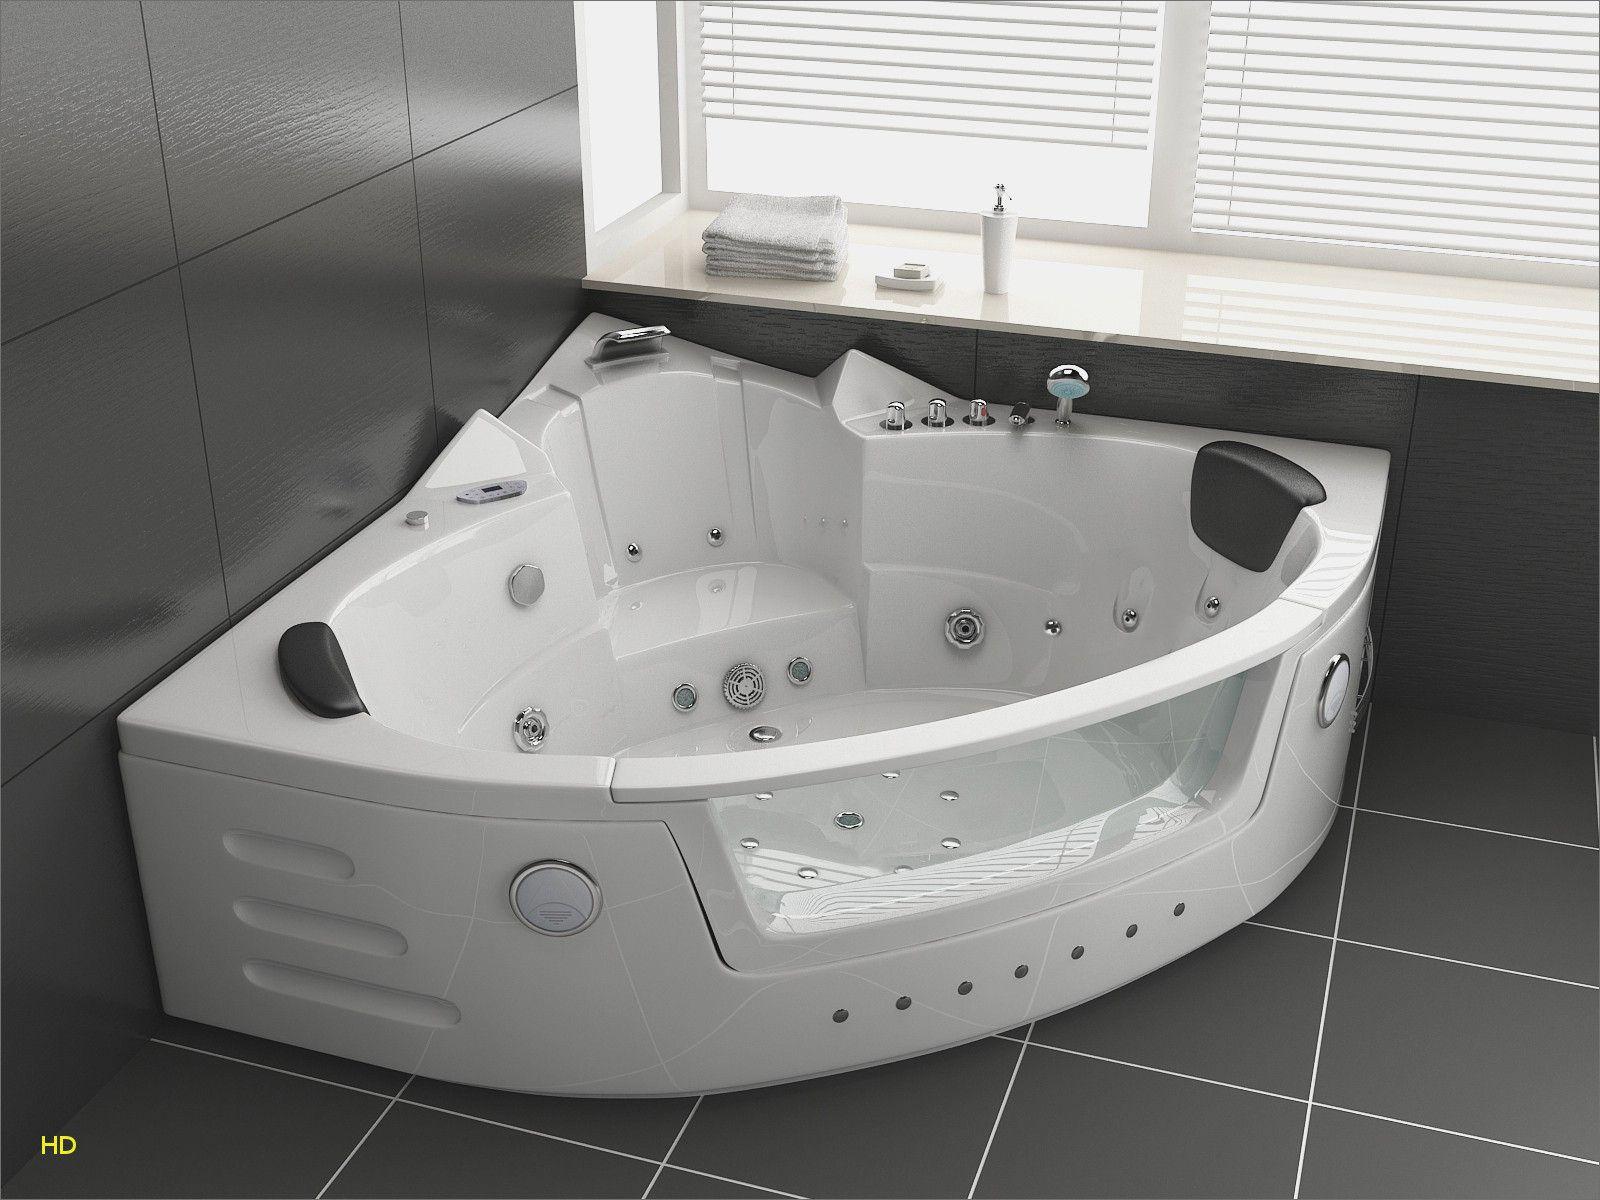 Habillage Baignoire D Angle Habillage Baignoire D Angle Habillage D Une Baignoire D Angle On Le Voudrait Arrondi Aim Bathtub Design Whirlpool Bathtub Bathtub